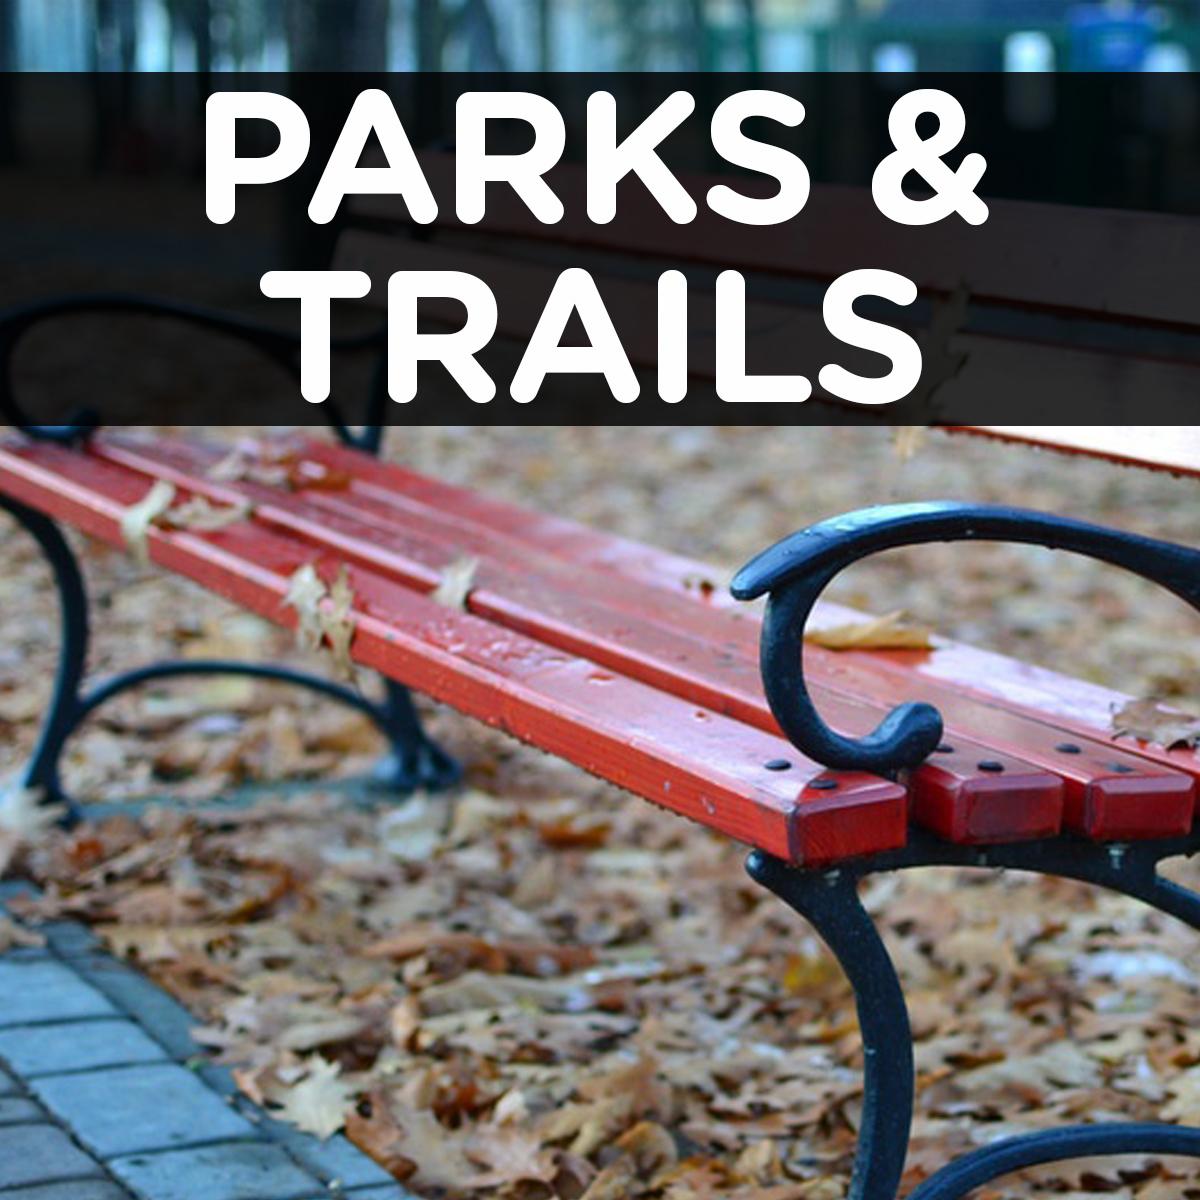 Parks & Trails.jpg